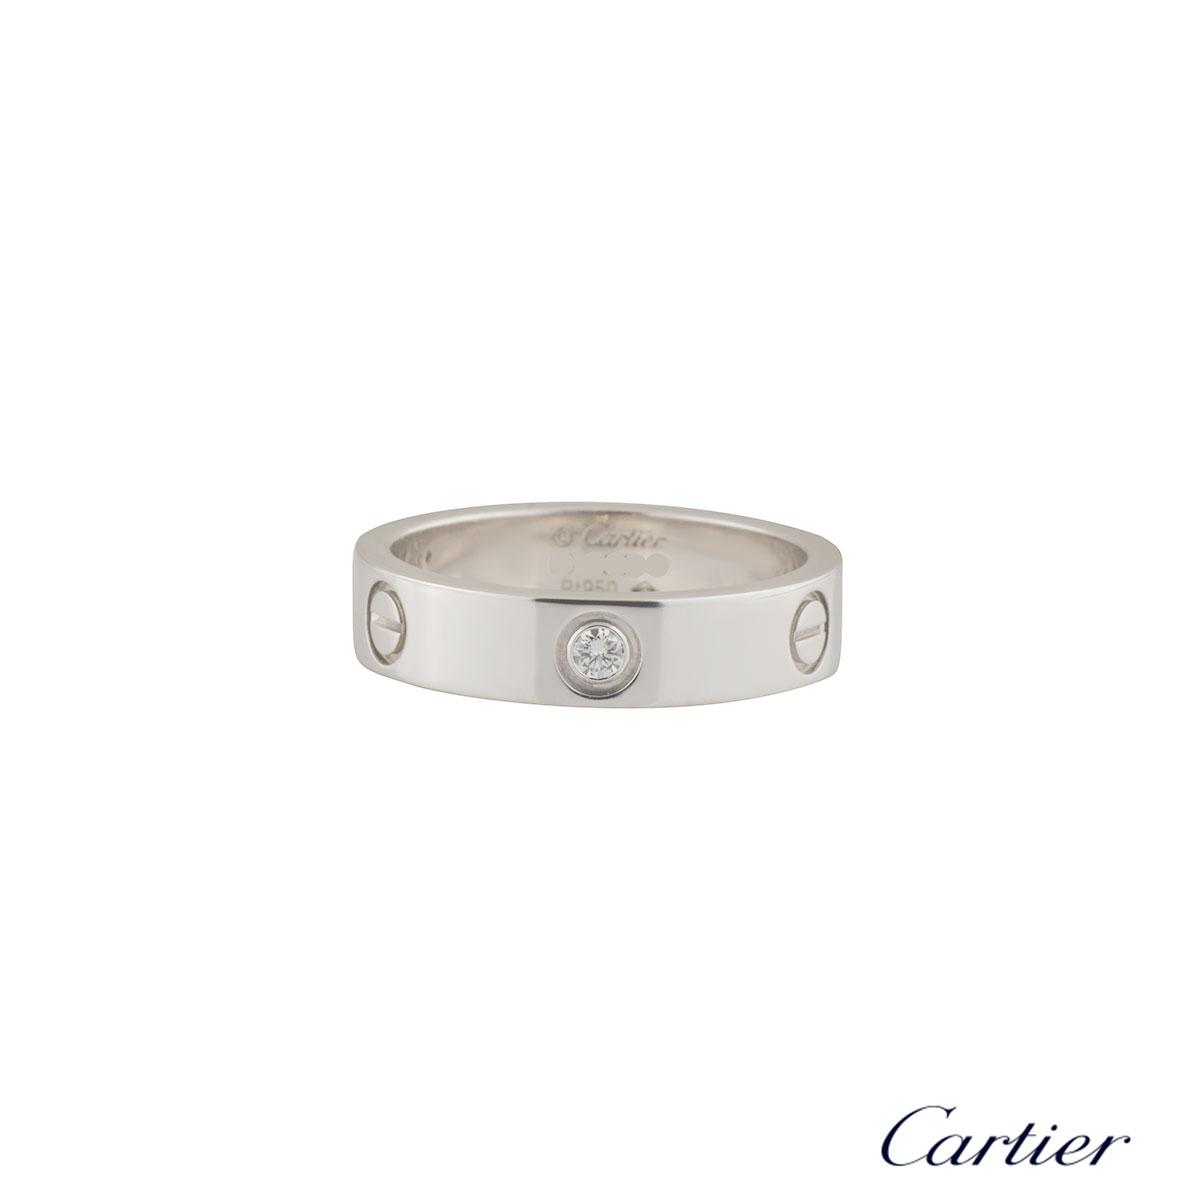 Cartier Platinum Diamond Love Ring B40646765